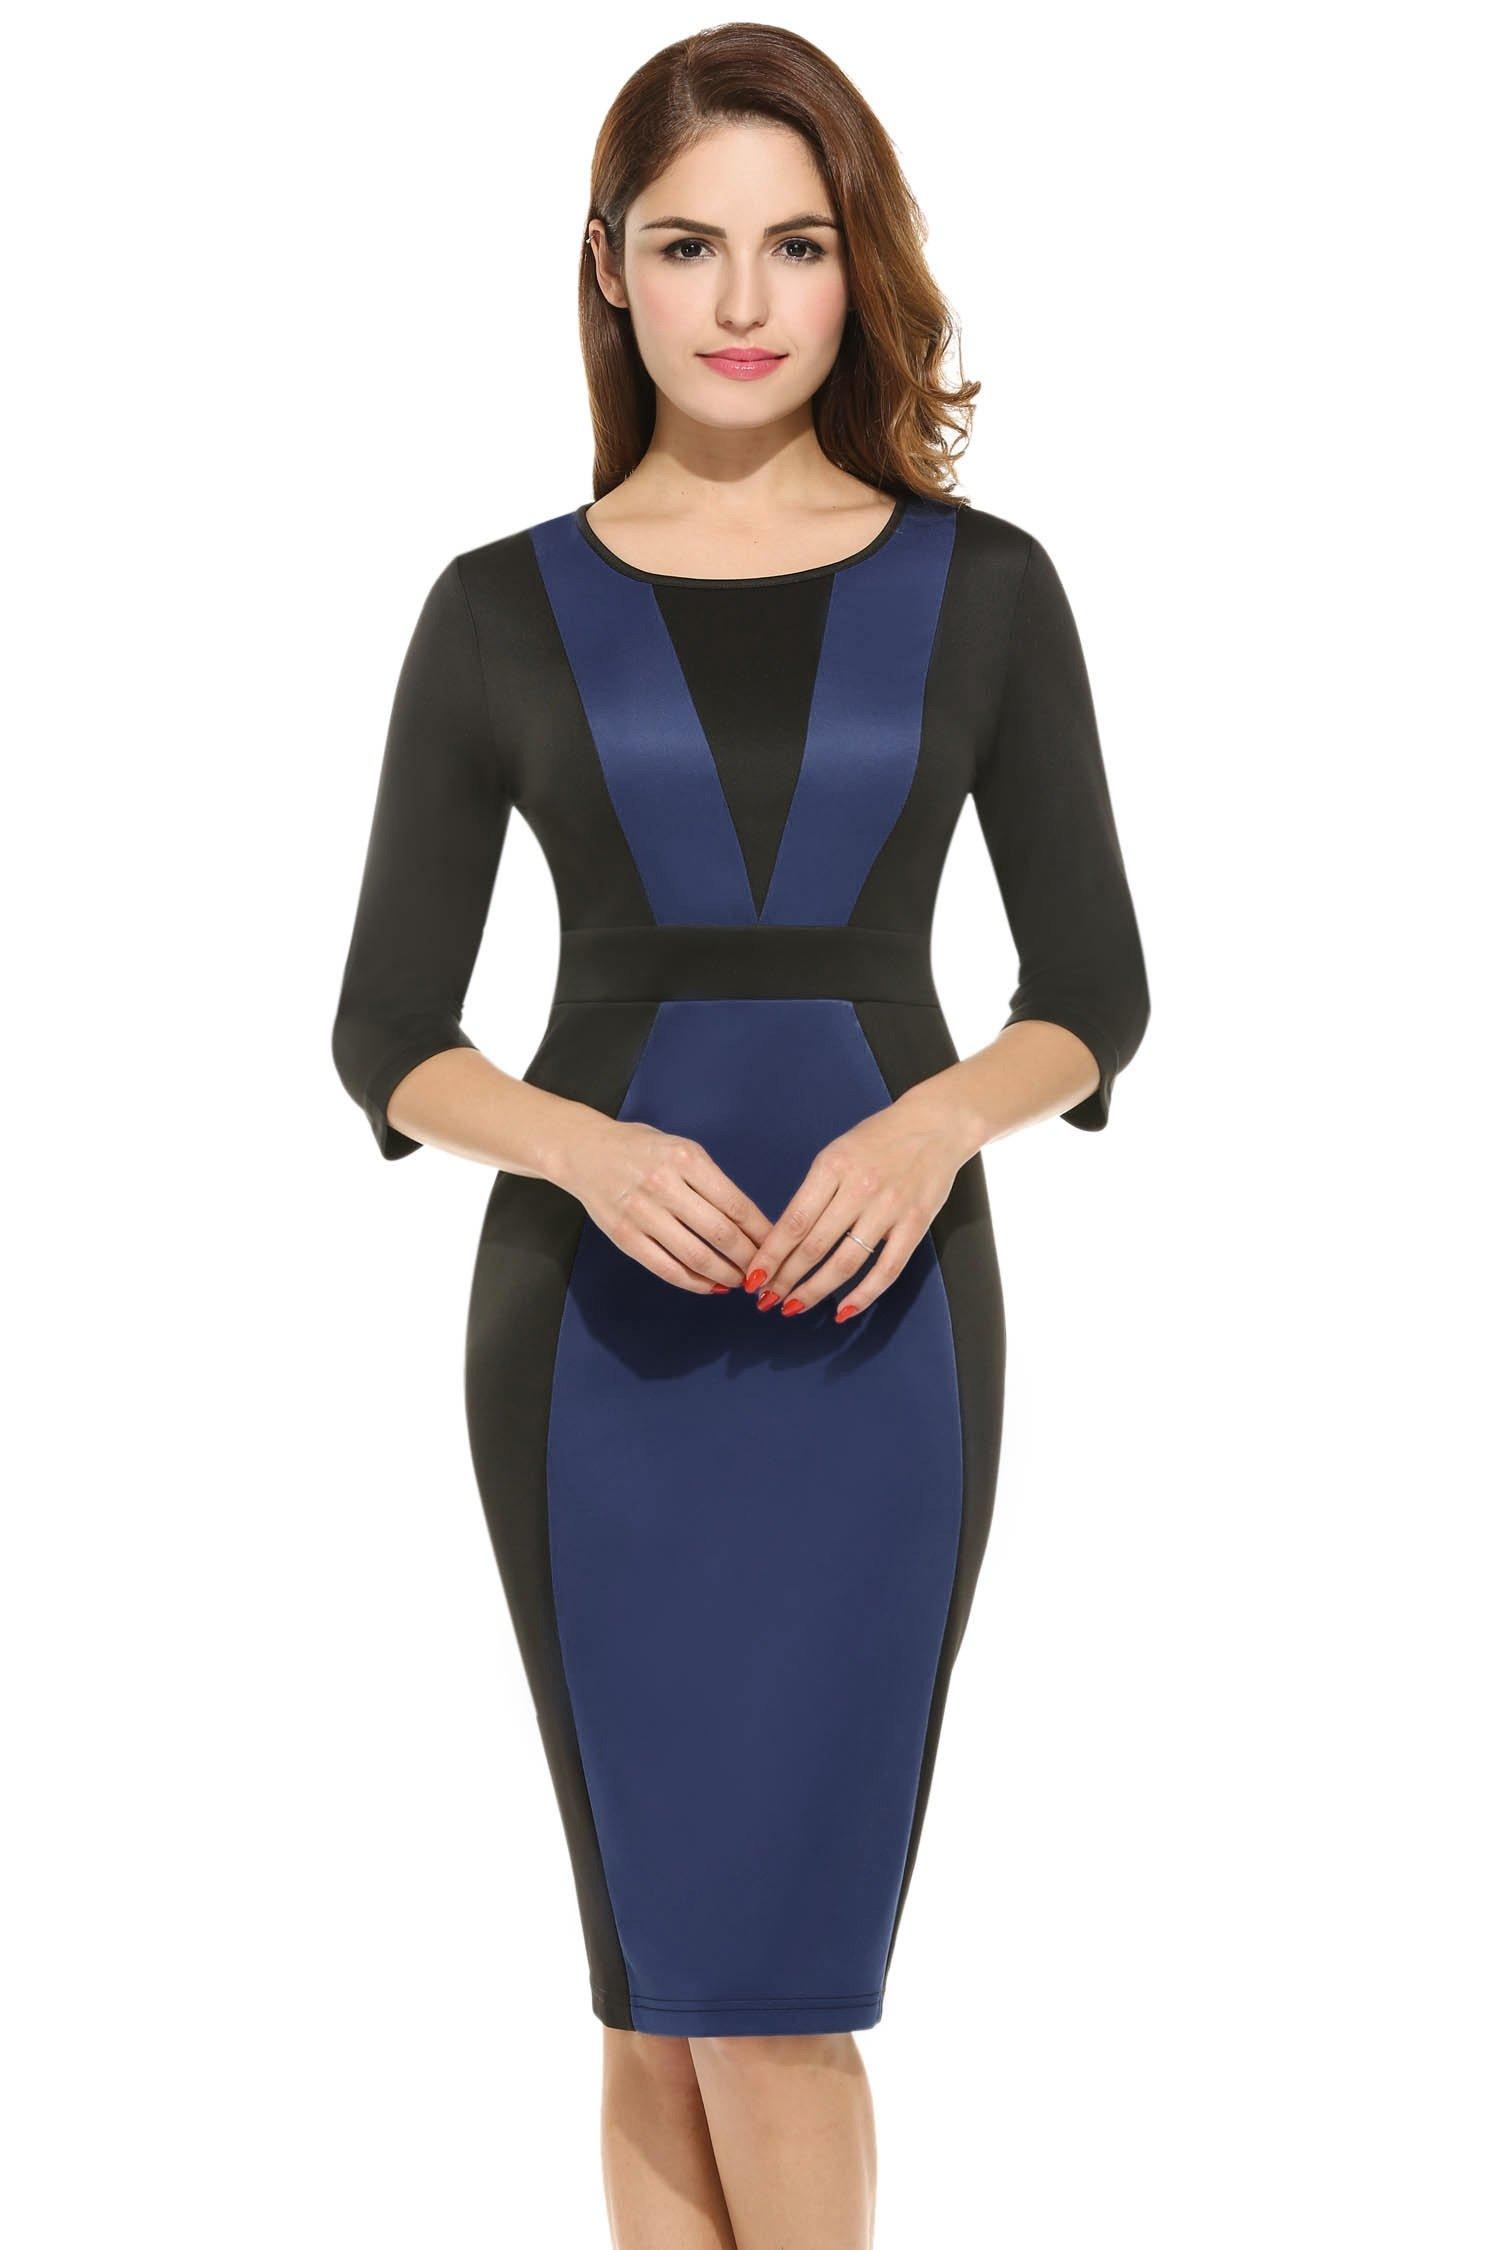 Hotouch Women's Retro Style Slim Business Pencil Dress (Navy Blue XL)